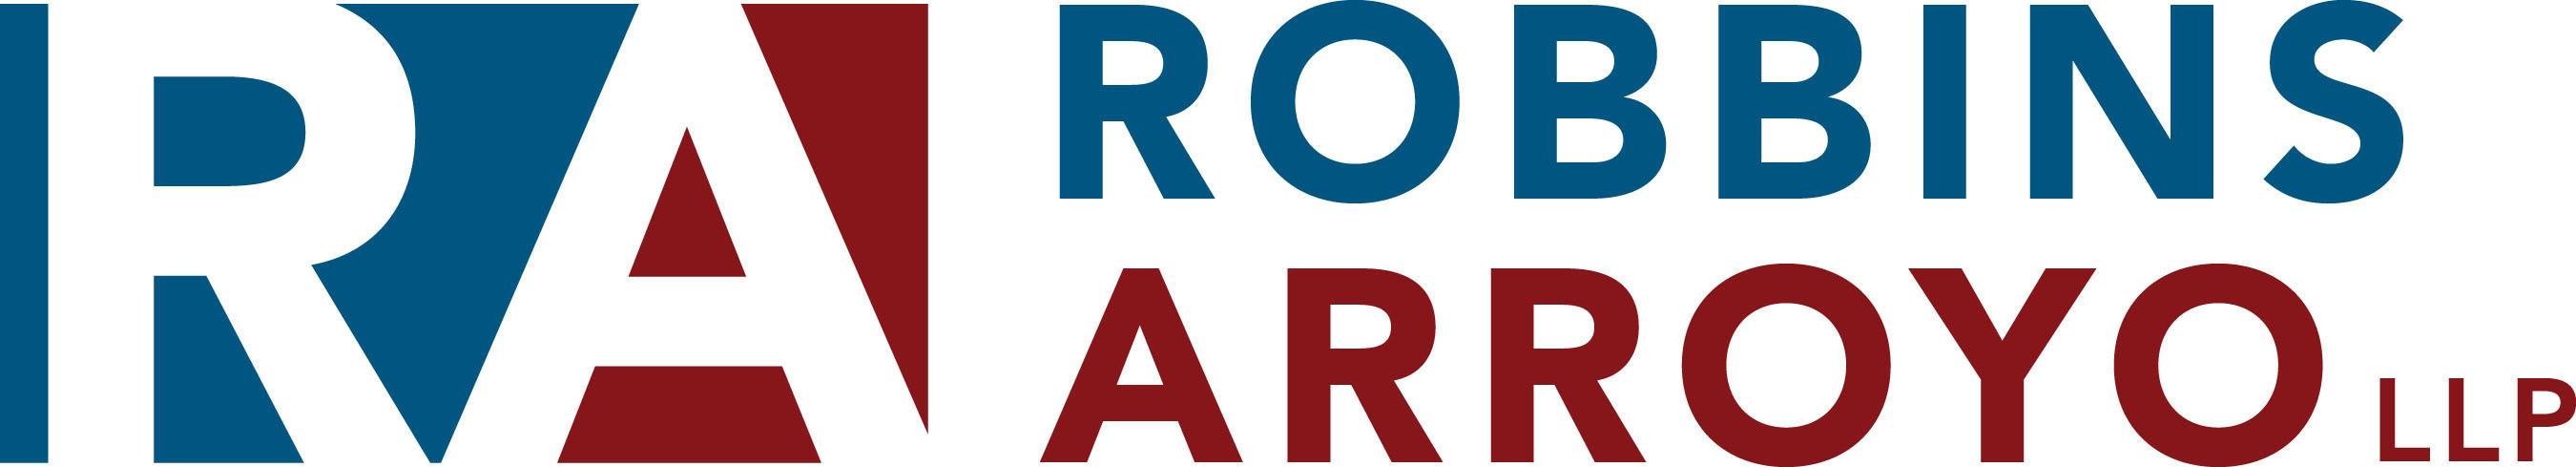 Robbins Arroyo LLP.